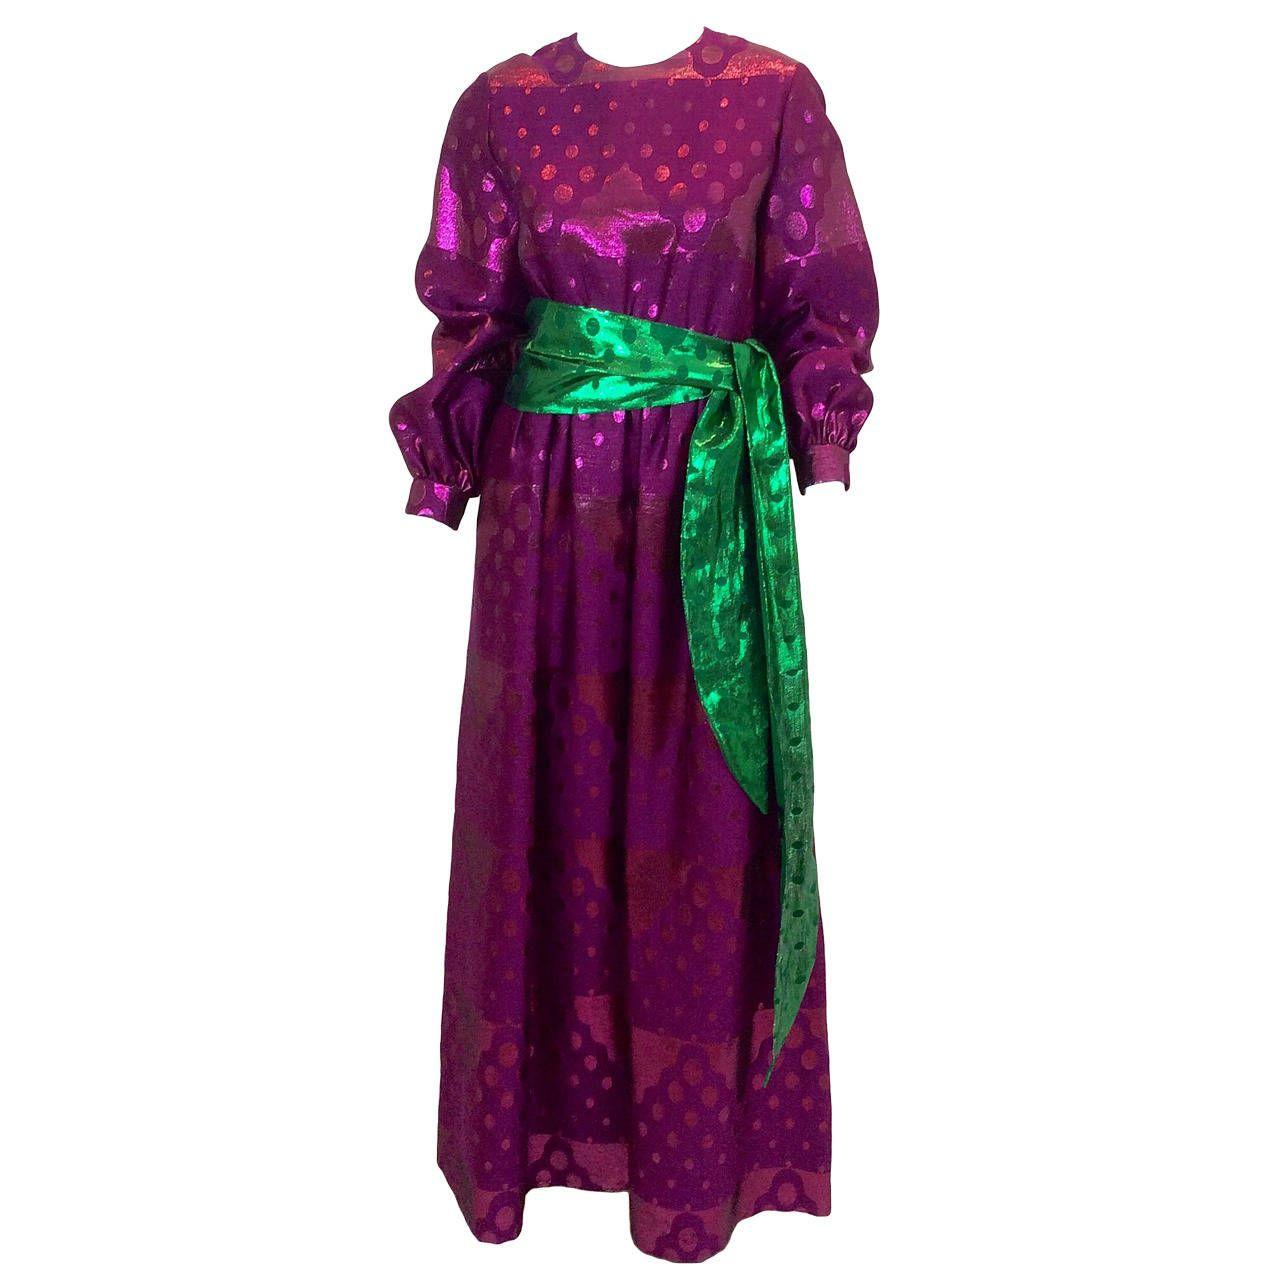 Oscar De La Renta 1960s Metallic Purple and Green Dress | Oscar de ...